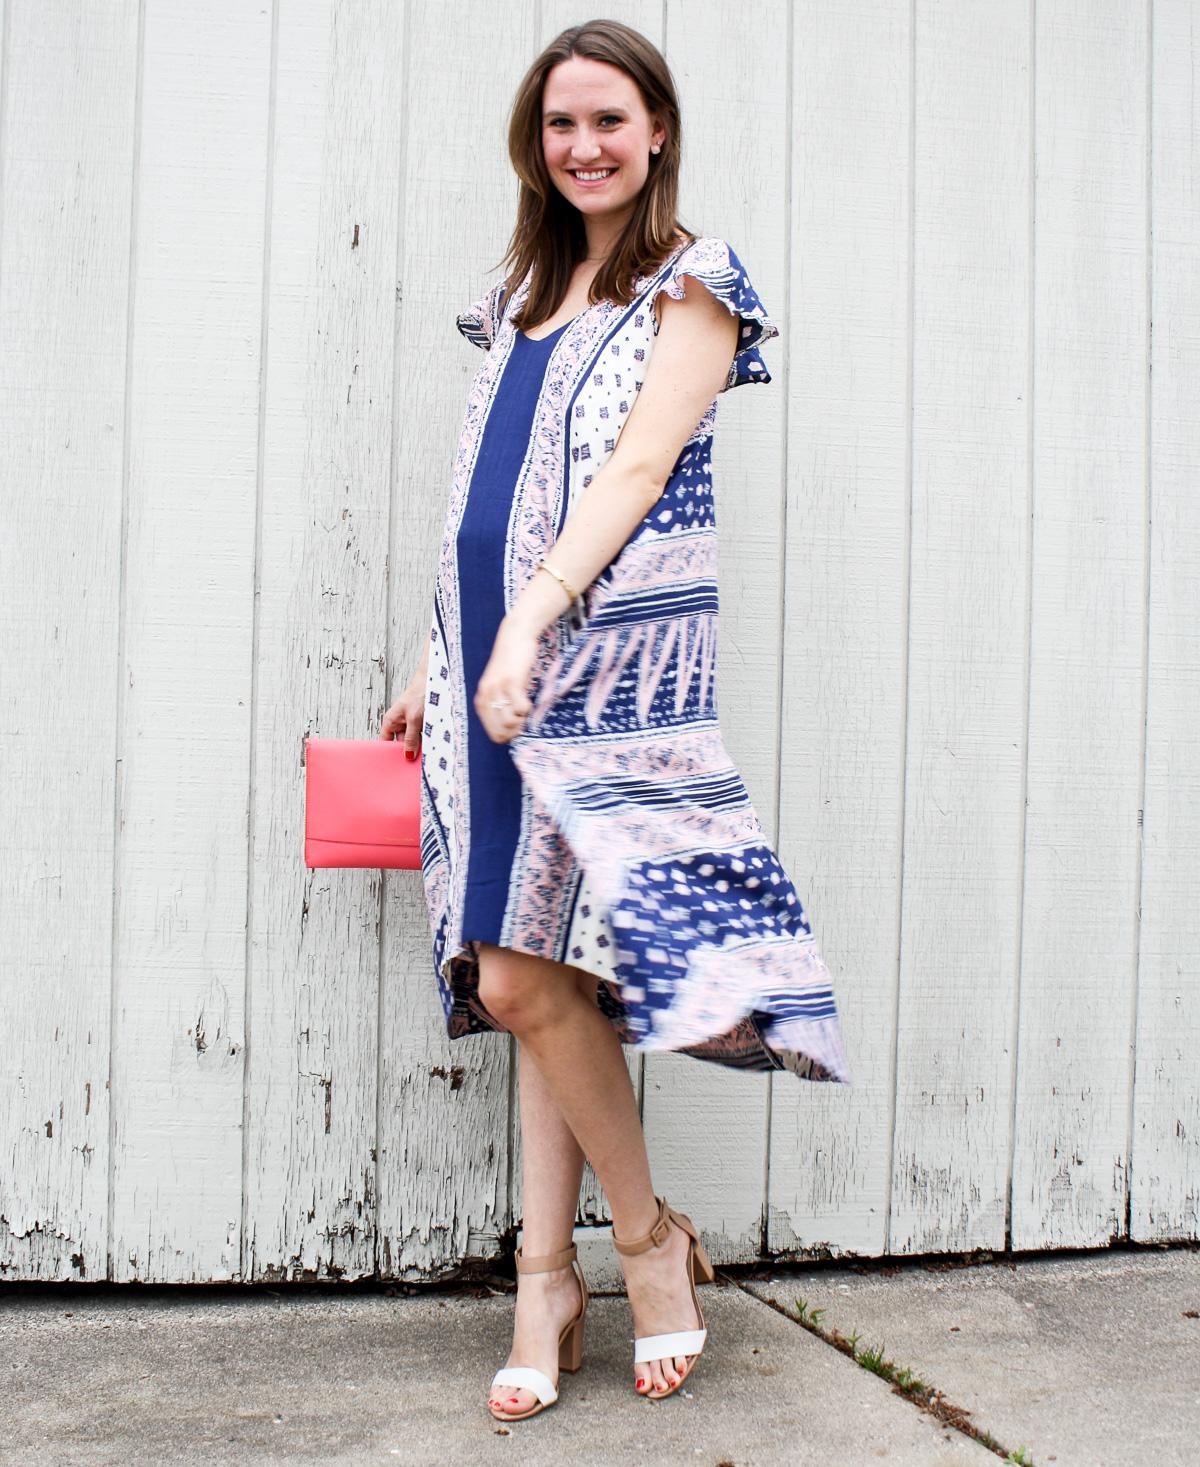 Pregnancy Style_Anthropologie Dress_Twirl in dress-1